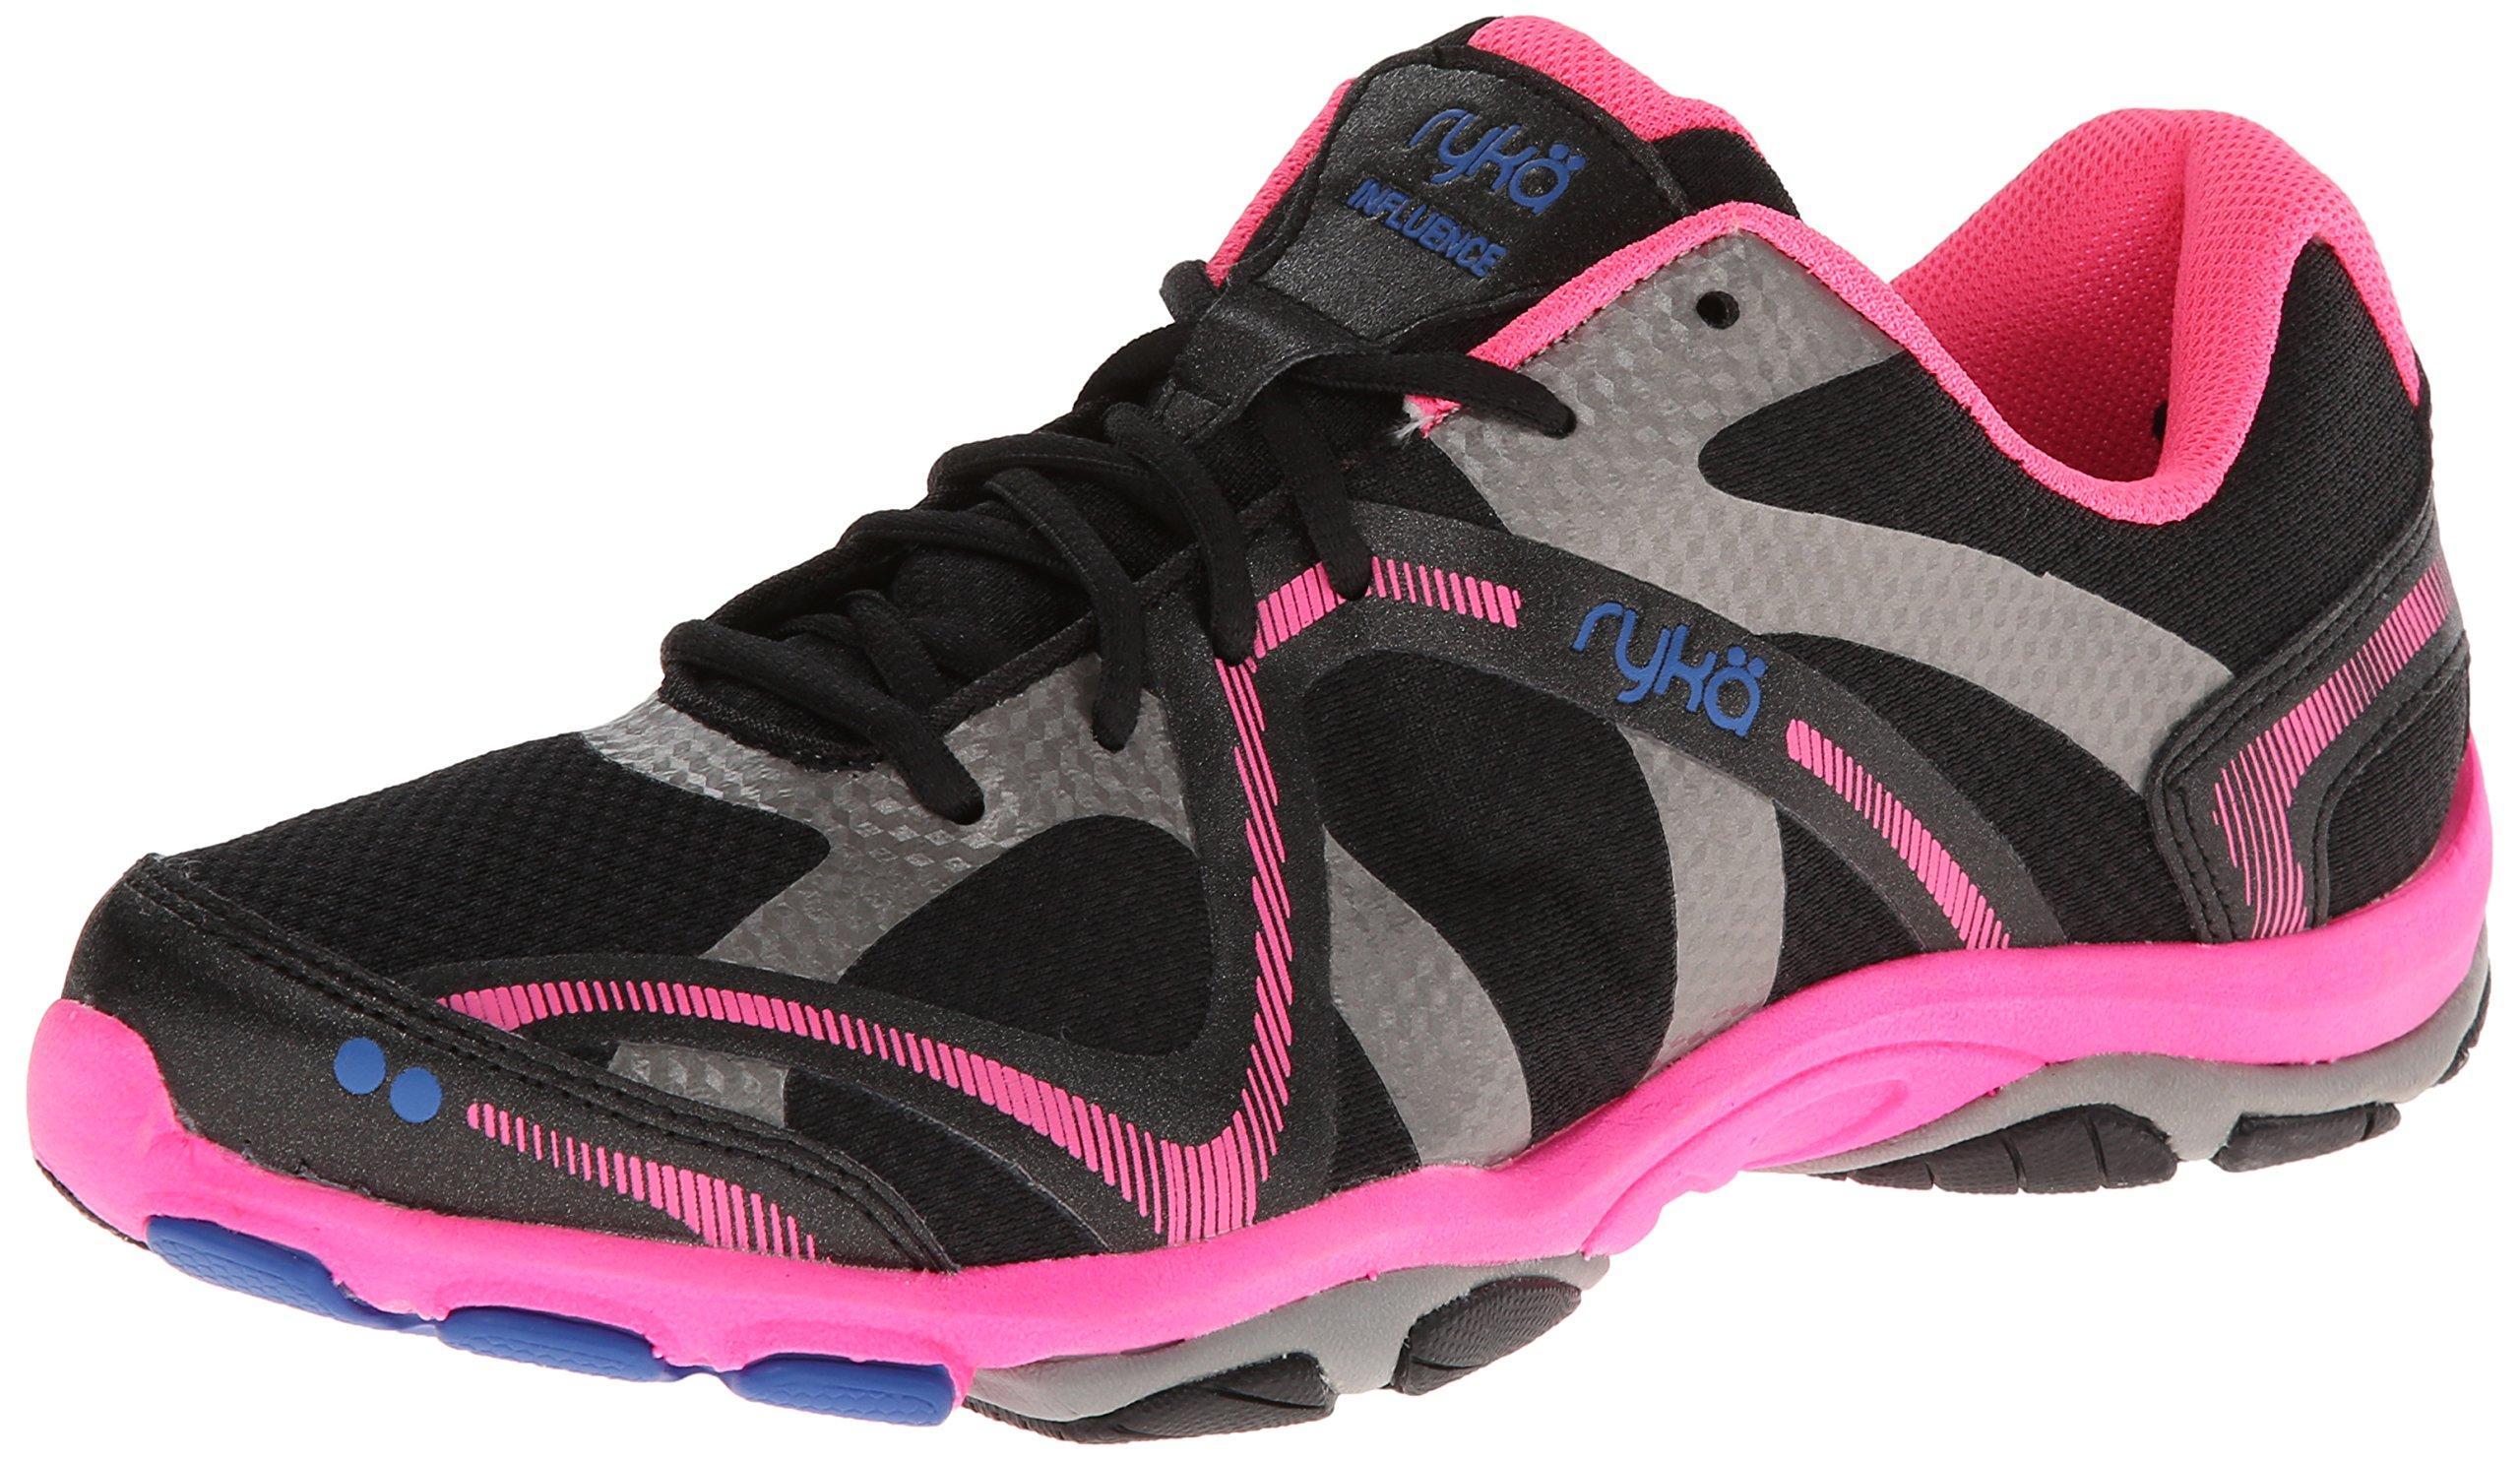 Ryka Women's Influence Training Shoe,Black/Atomic Pink/Royal Blue/Forge Grey,8 M US